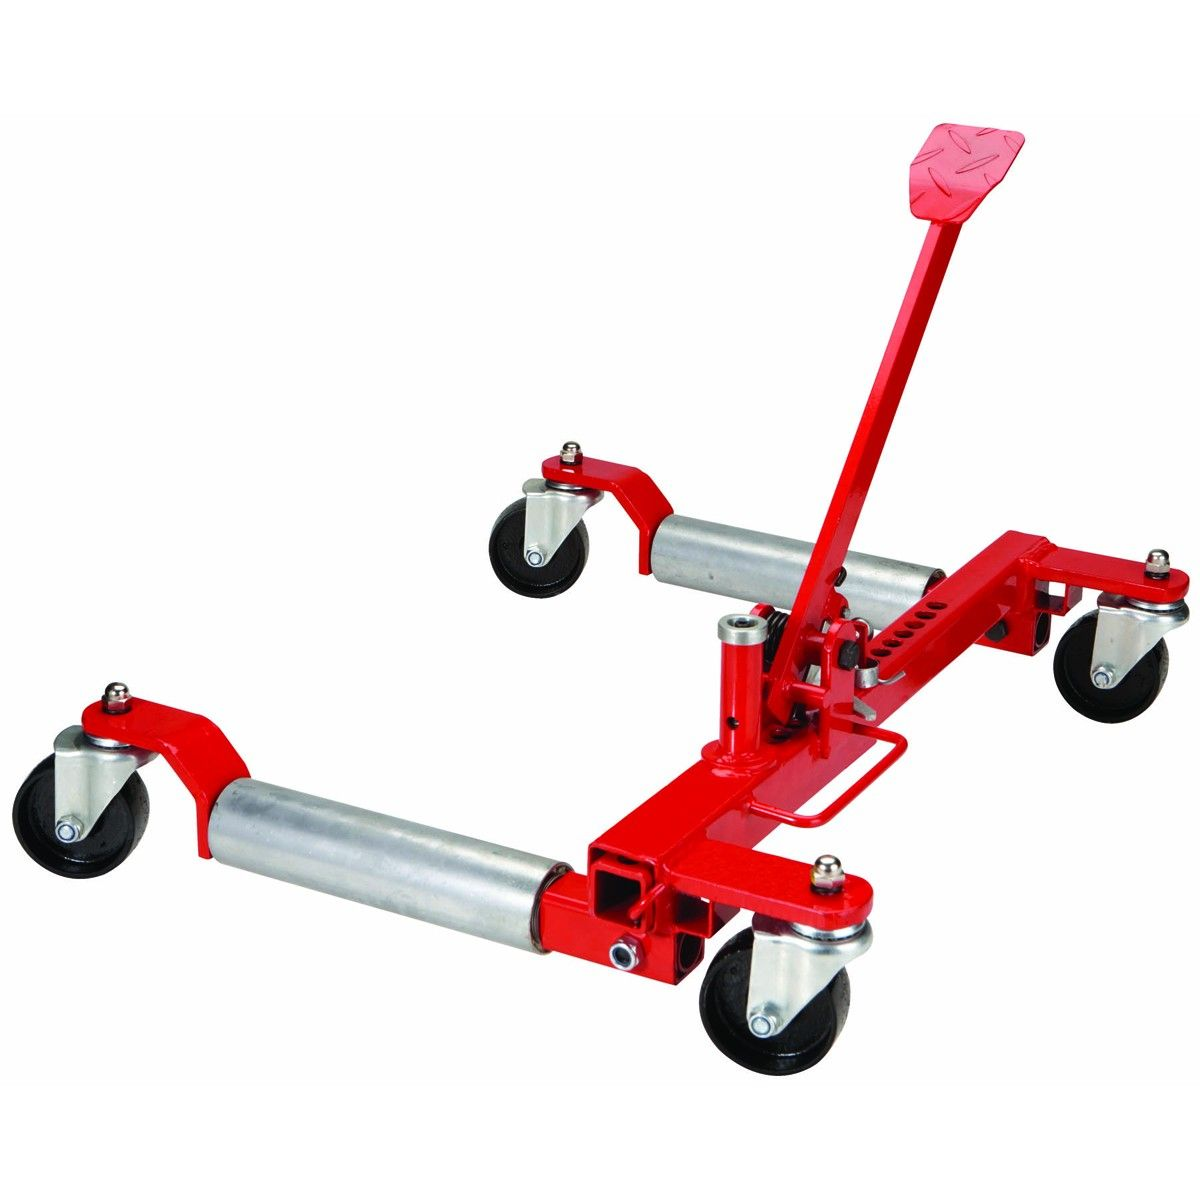 Wheel dolly autobarn push lawn mower reviews